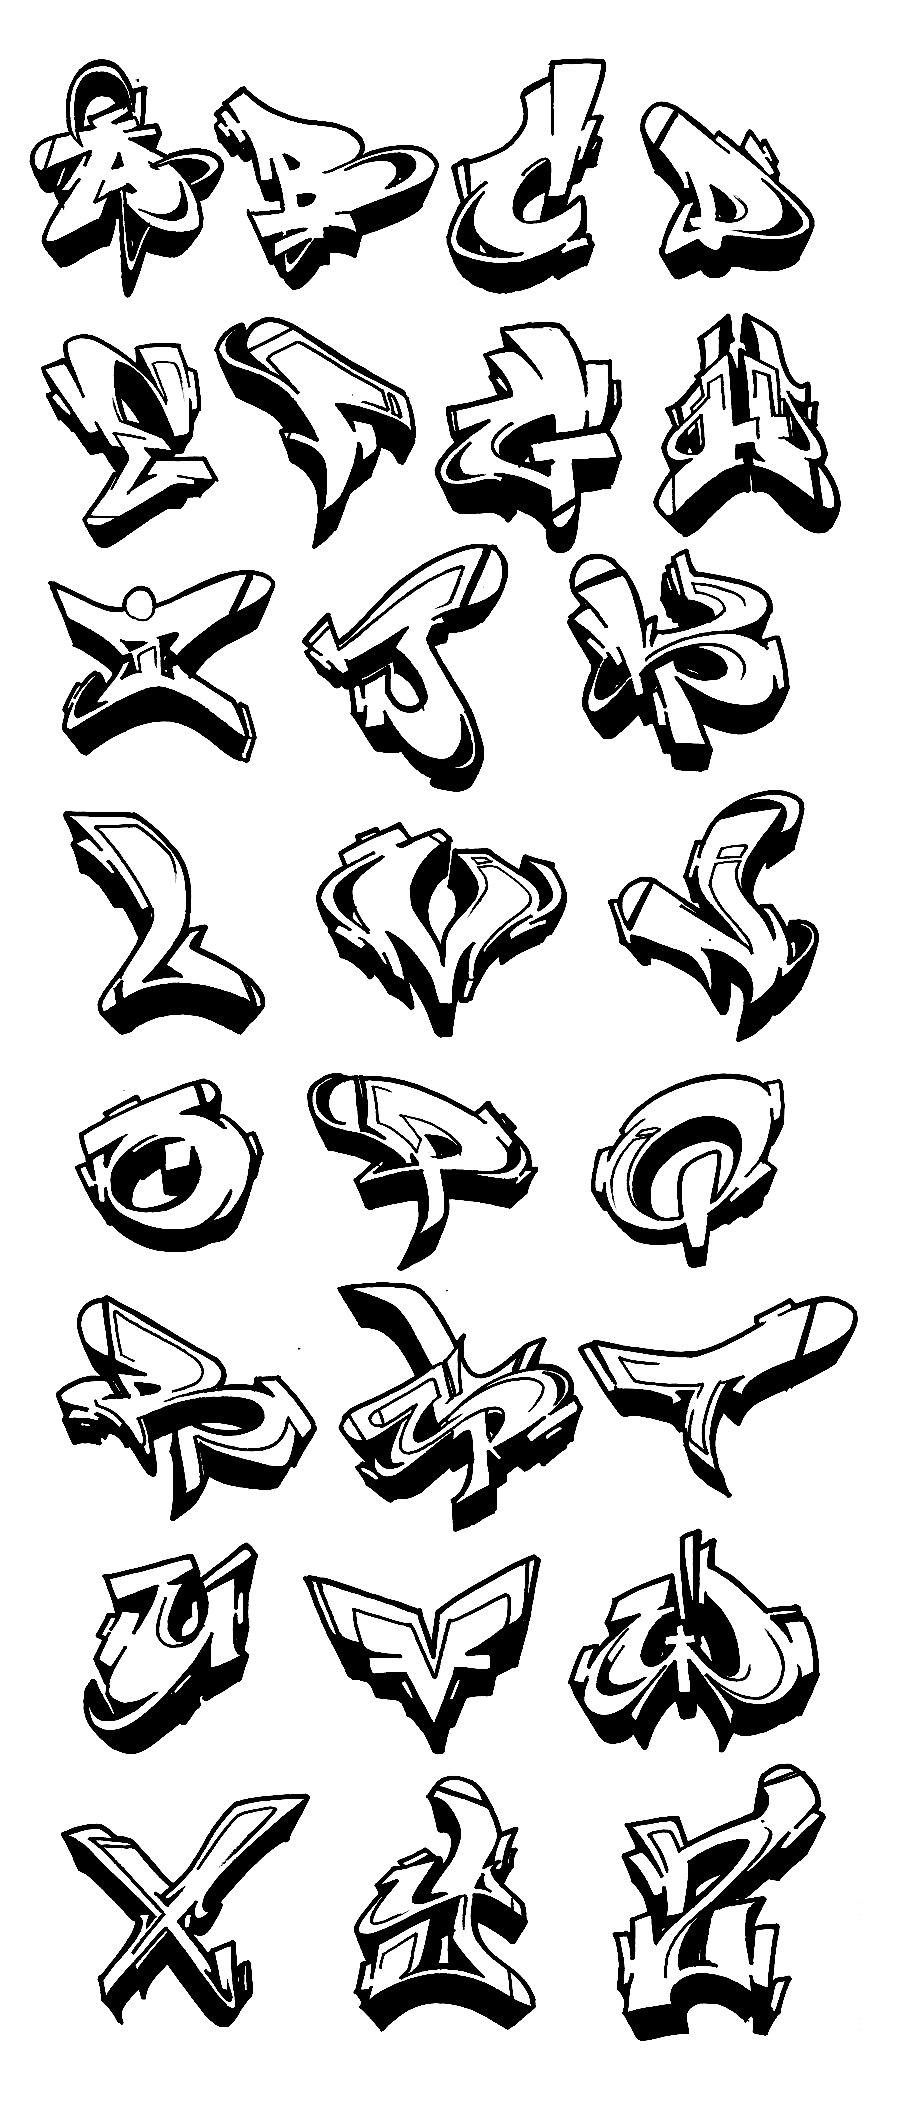 900x2107 Graffiti Drawings Of Alphabet Grafitti On Graffiti